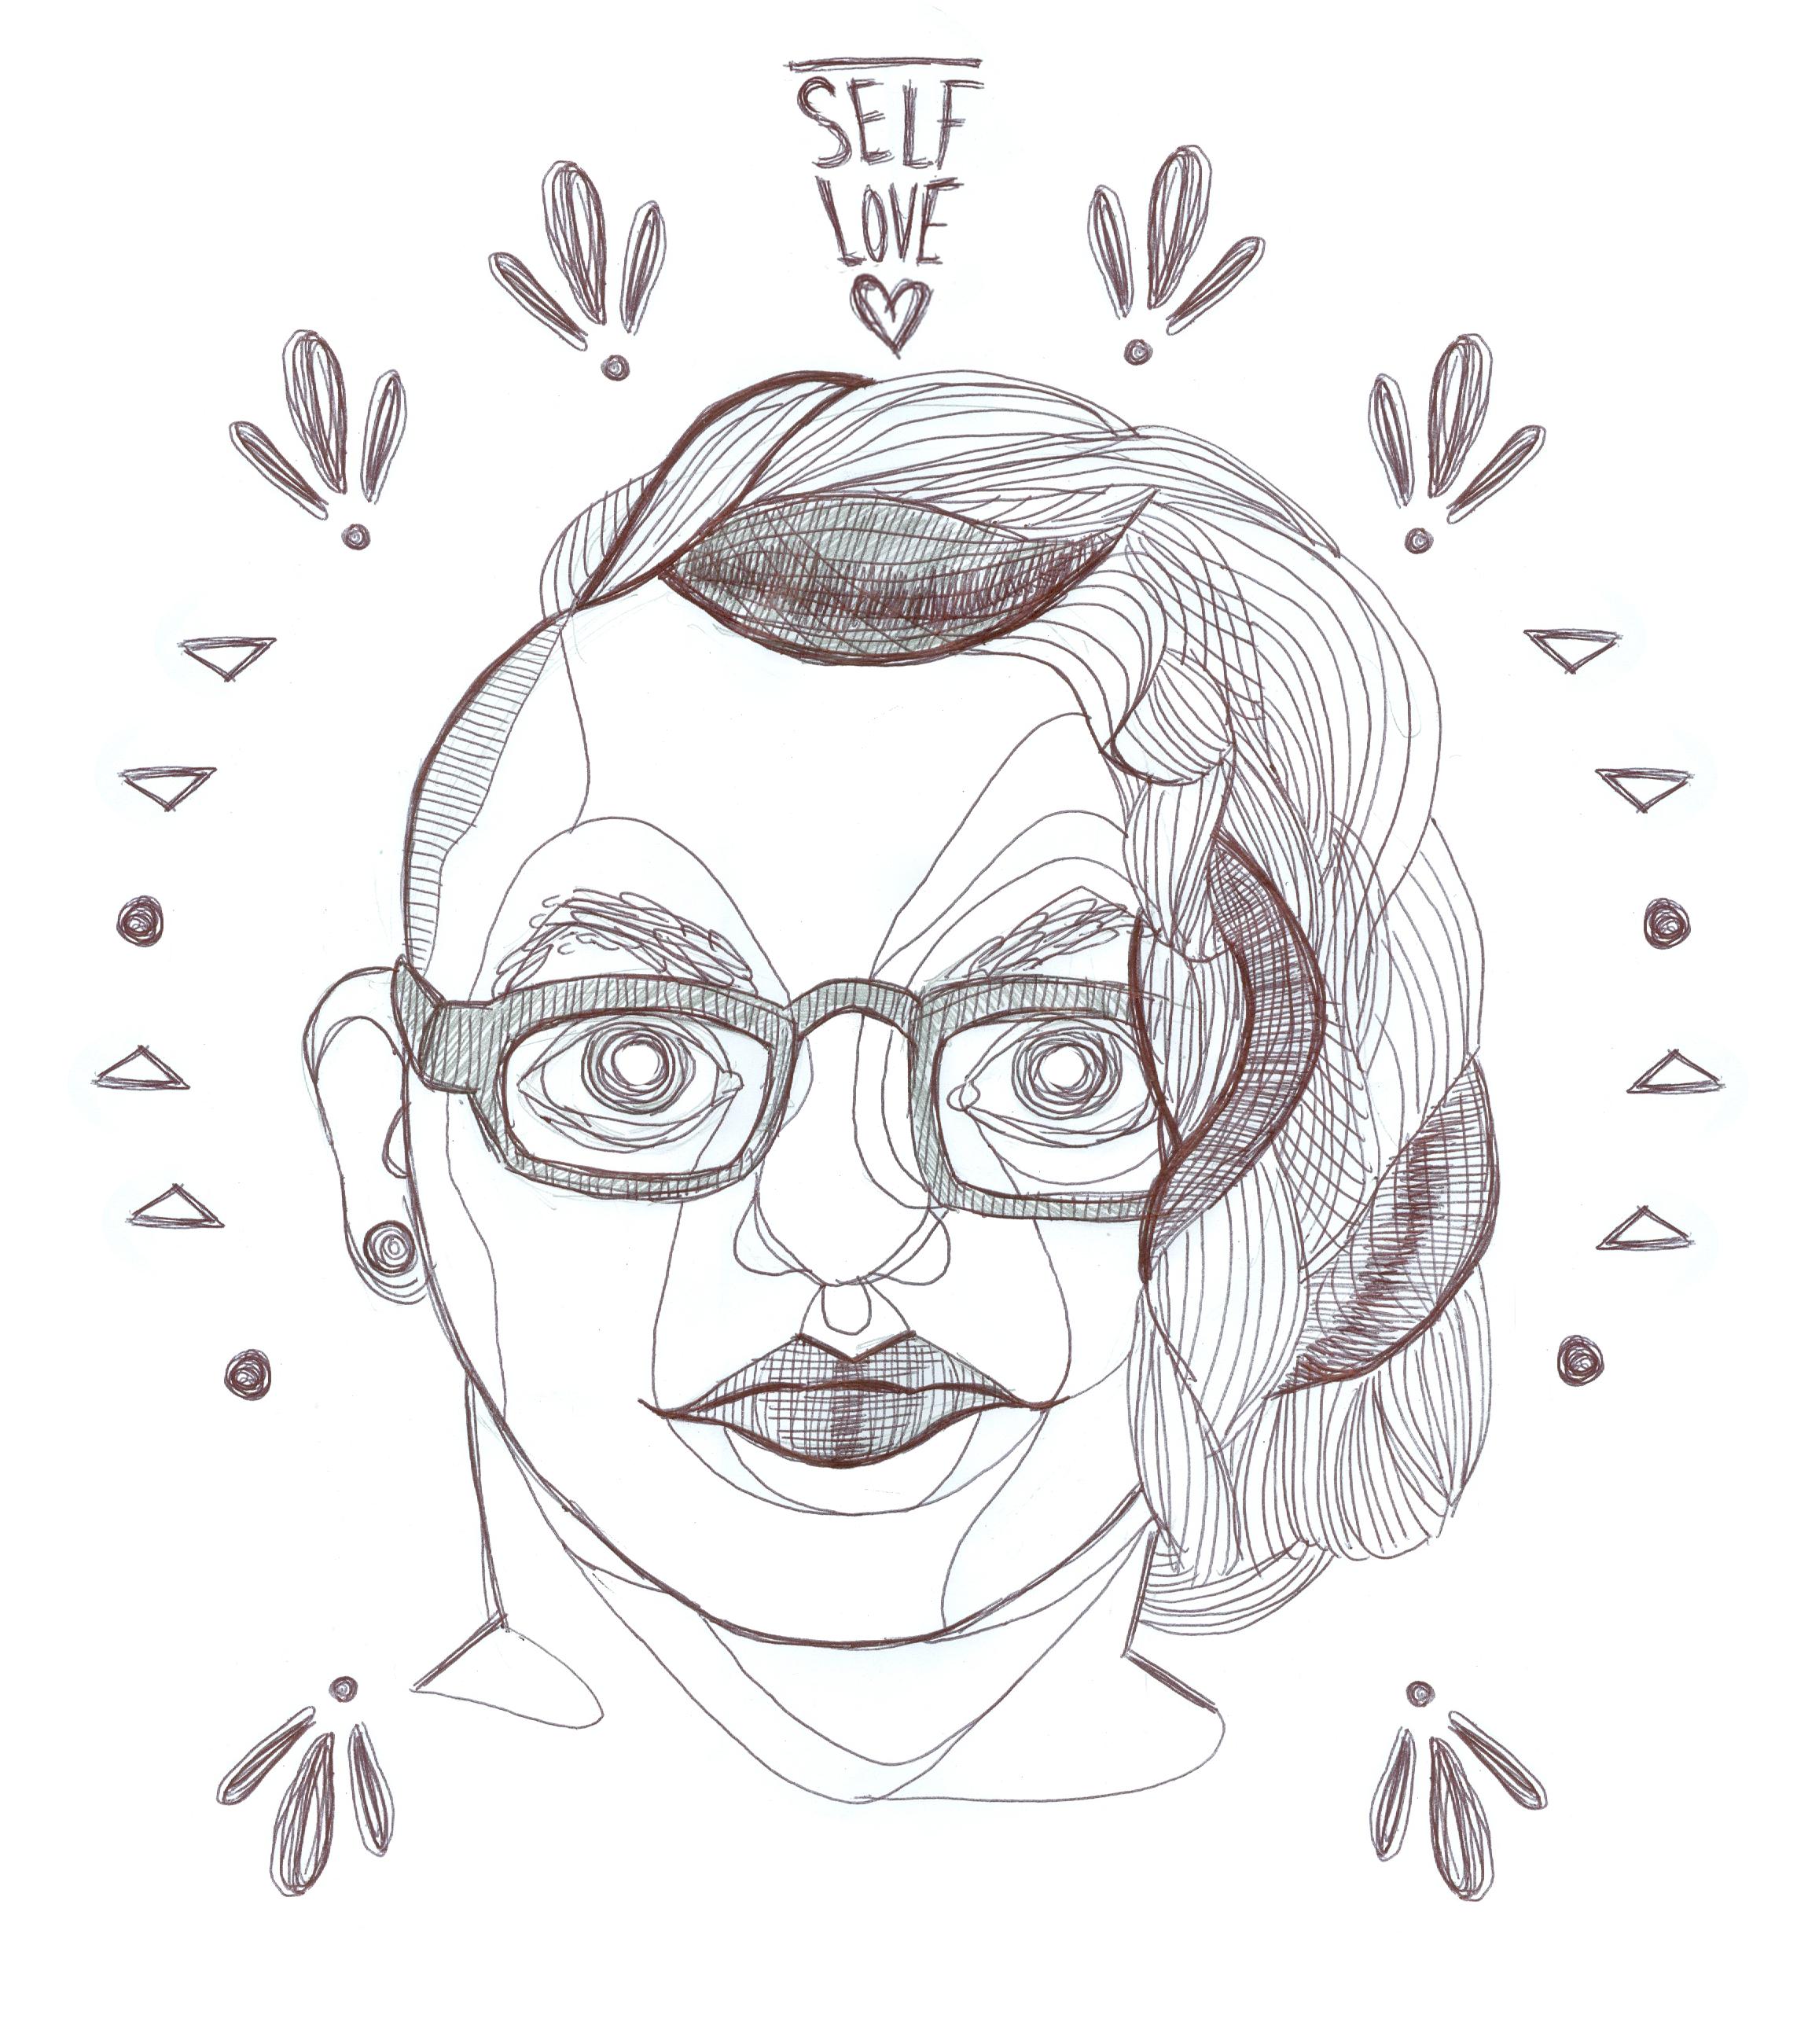 Ariel Estrella's self-portrait